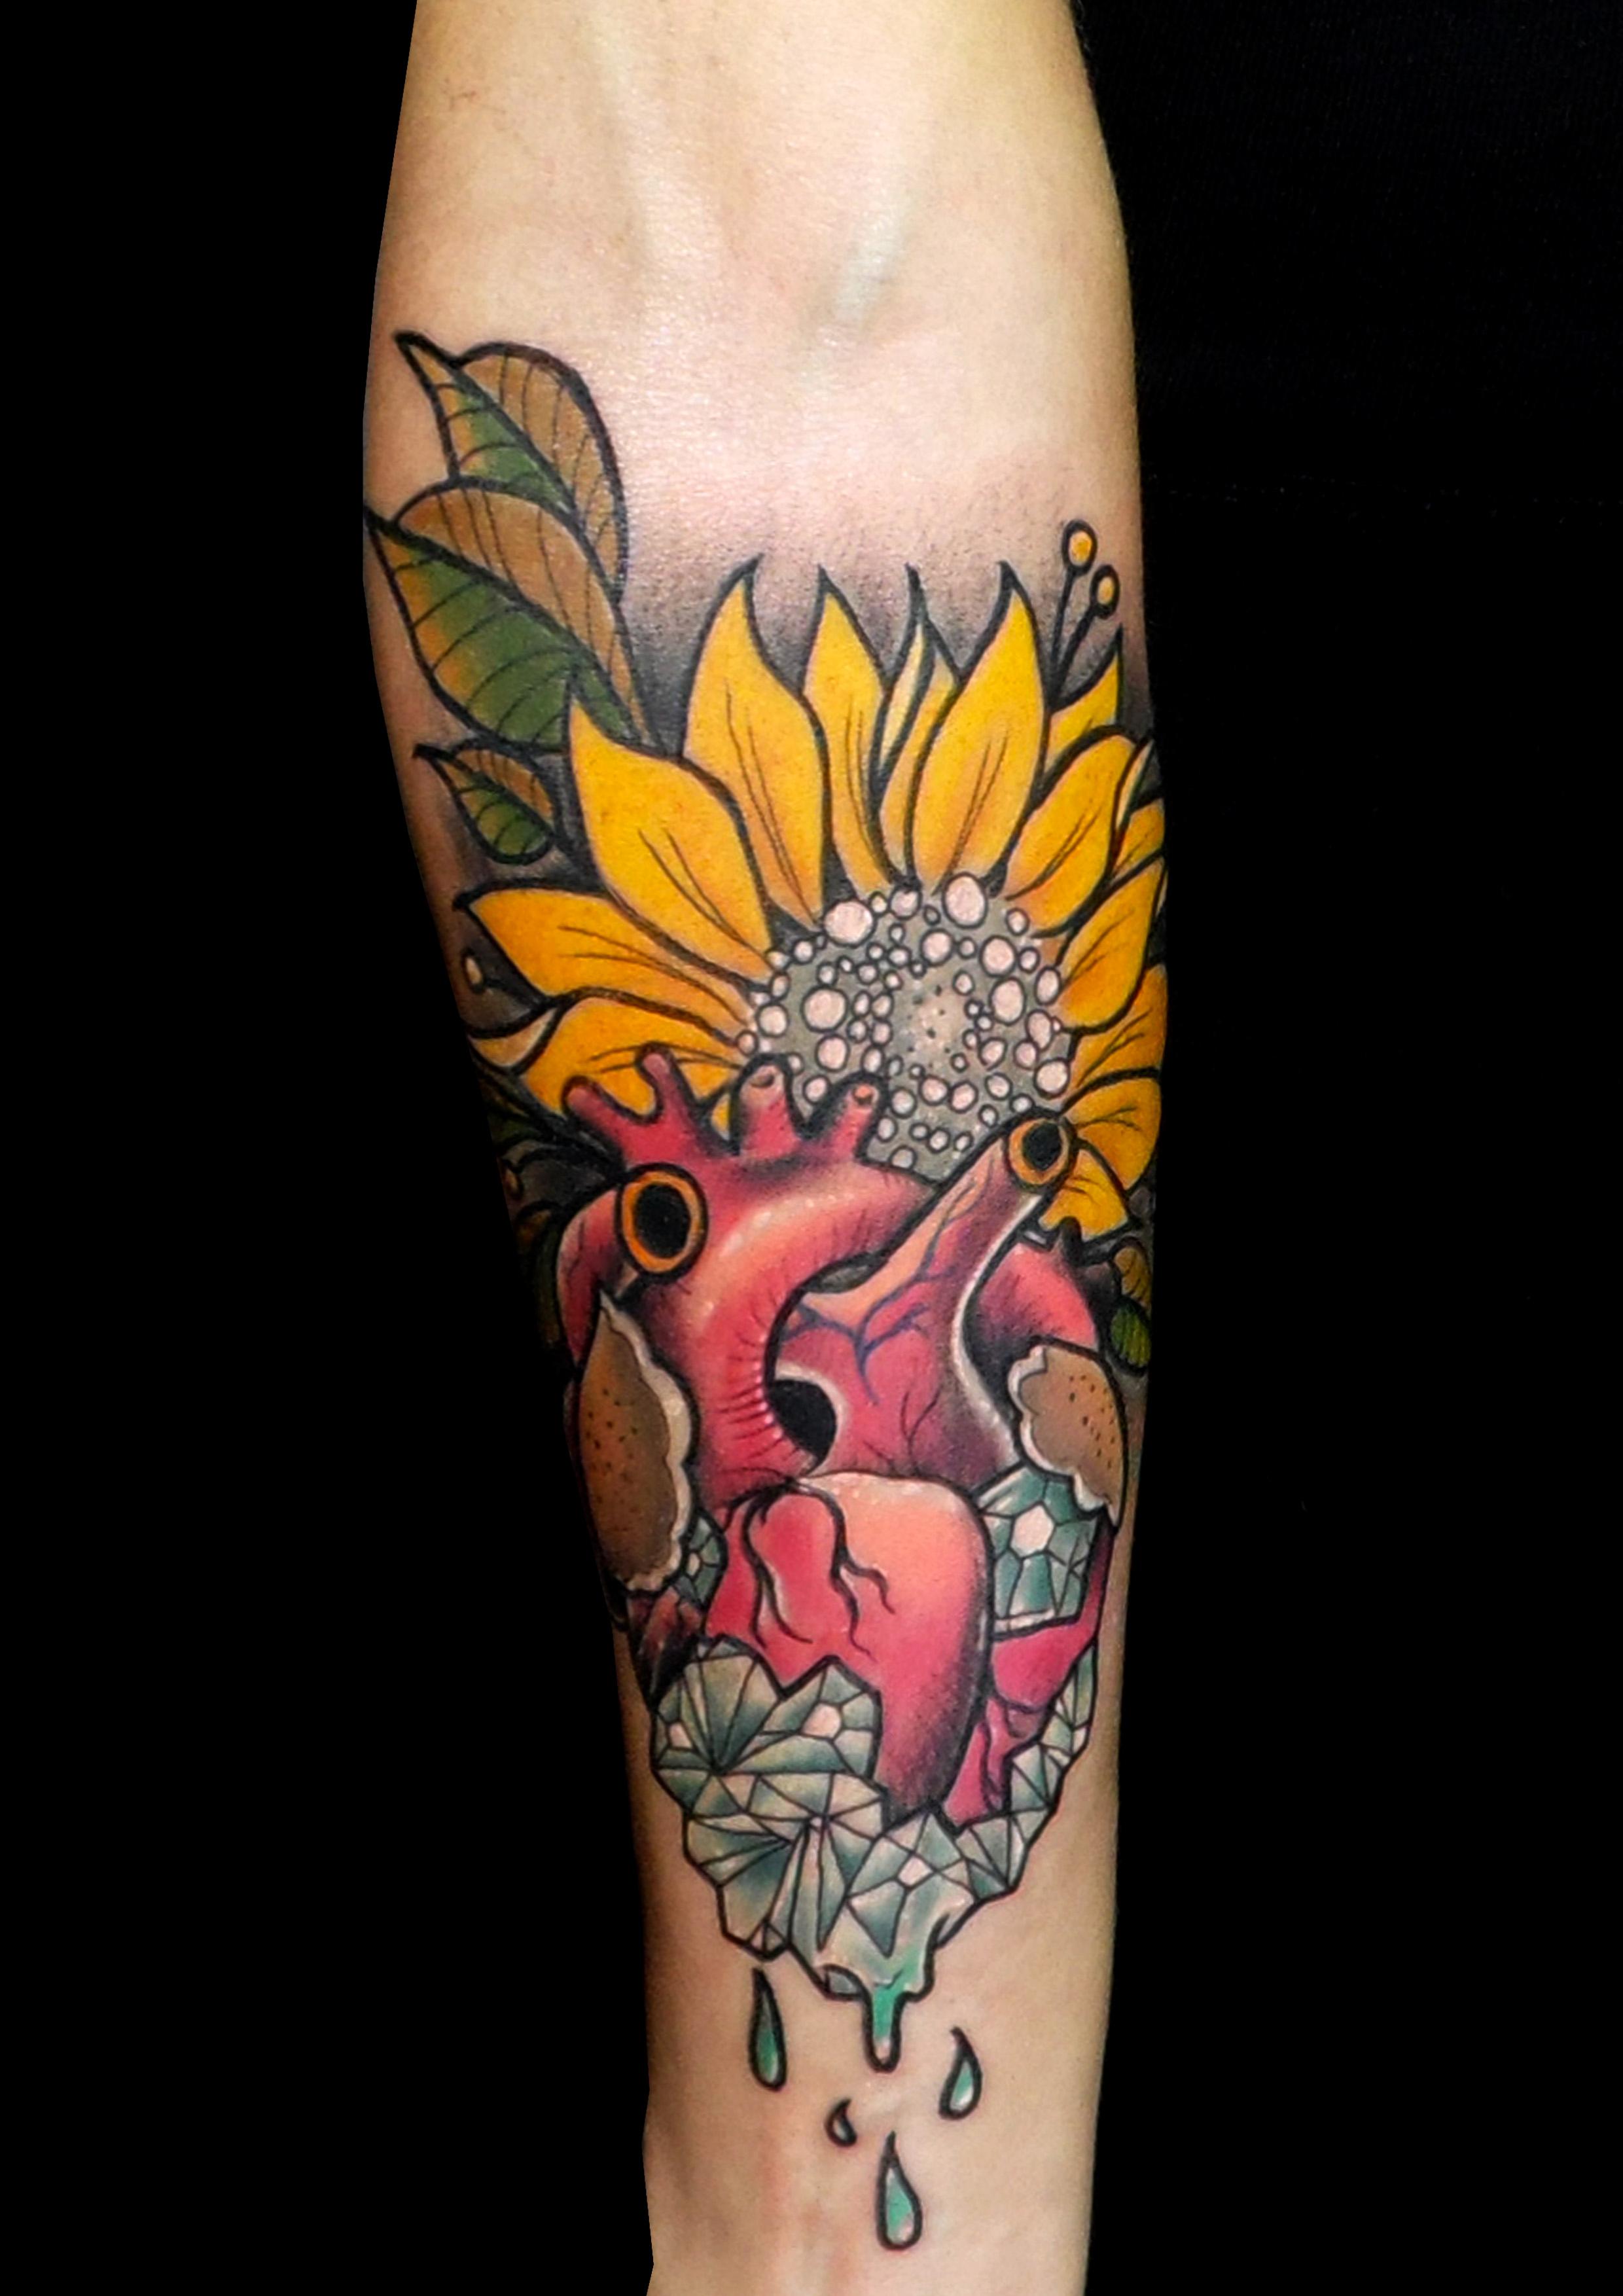 tatuaje tattoo antebrazo color girasol corazón diamante neo tradicional 13depicas jaca huesca pamplona